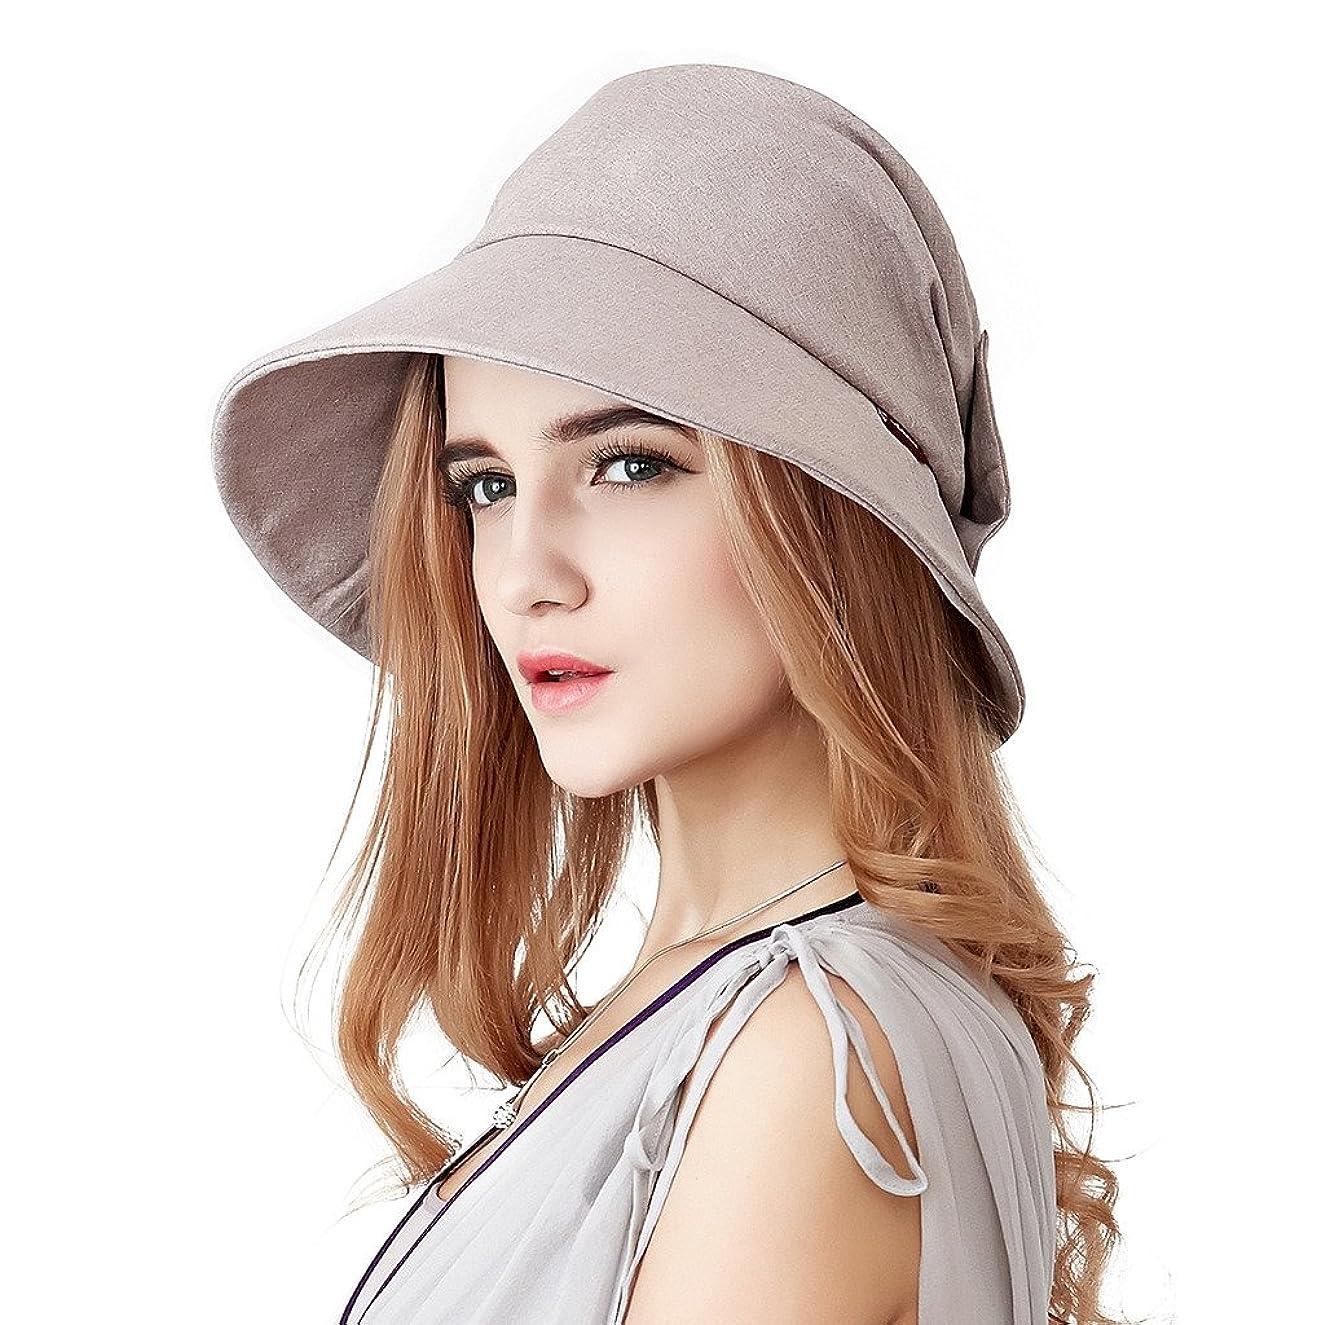 Home Prefer Womens Sun Hat UPF50+ Beach Hat Foldable Light Weight Sun Protective